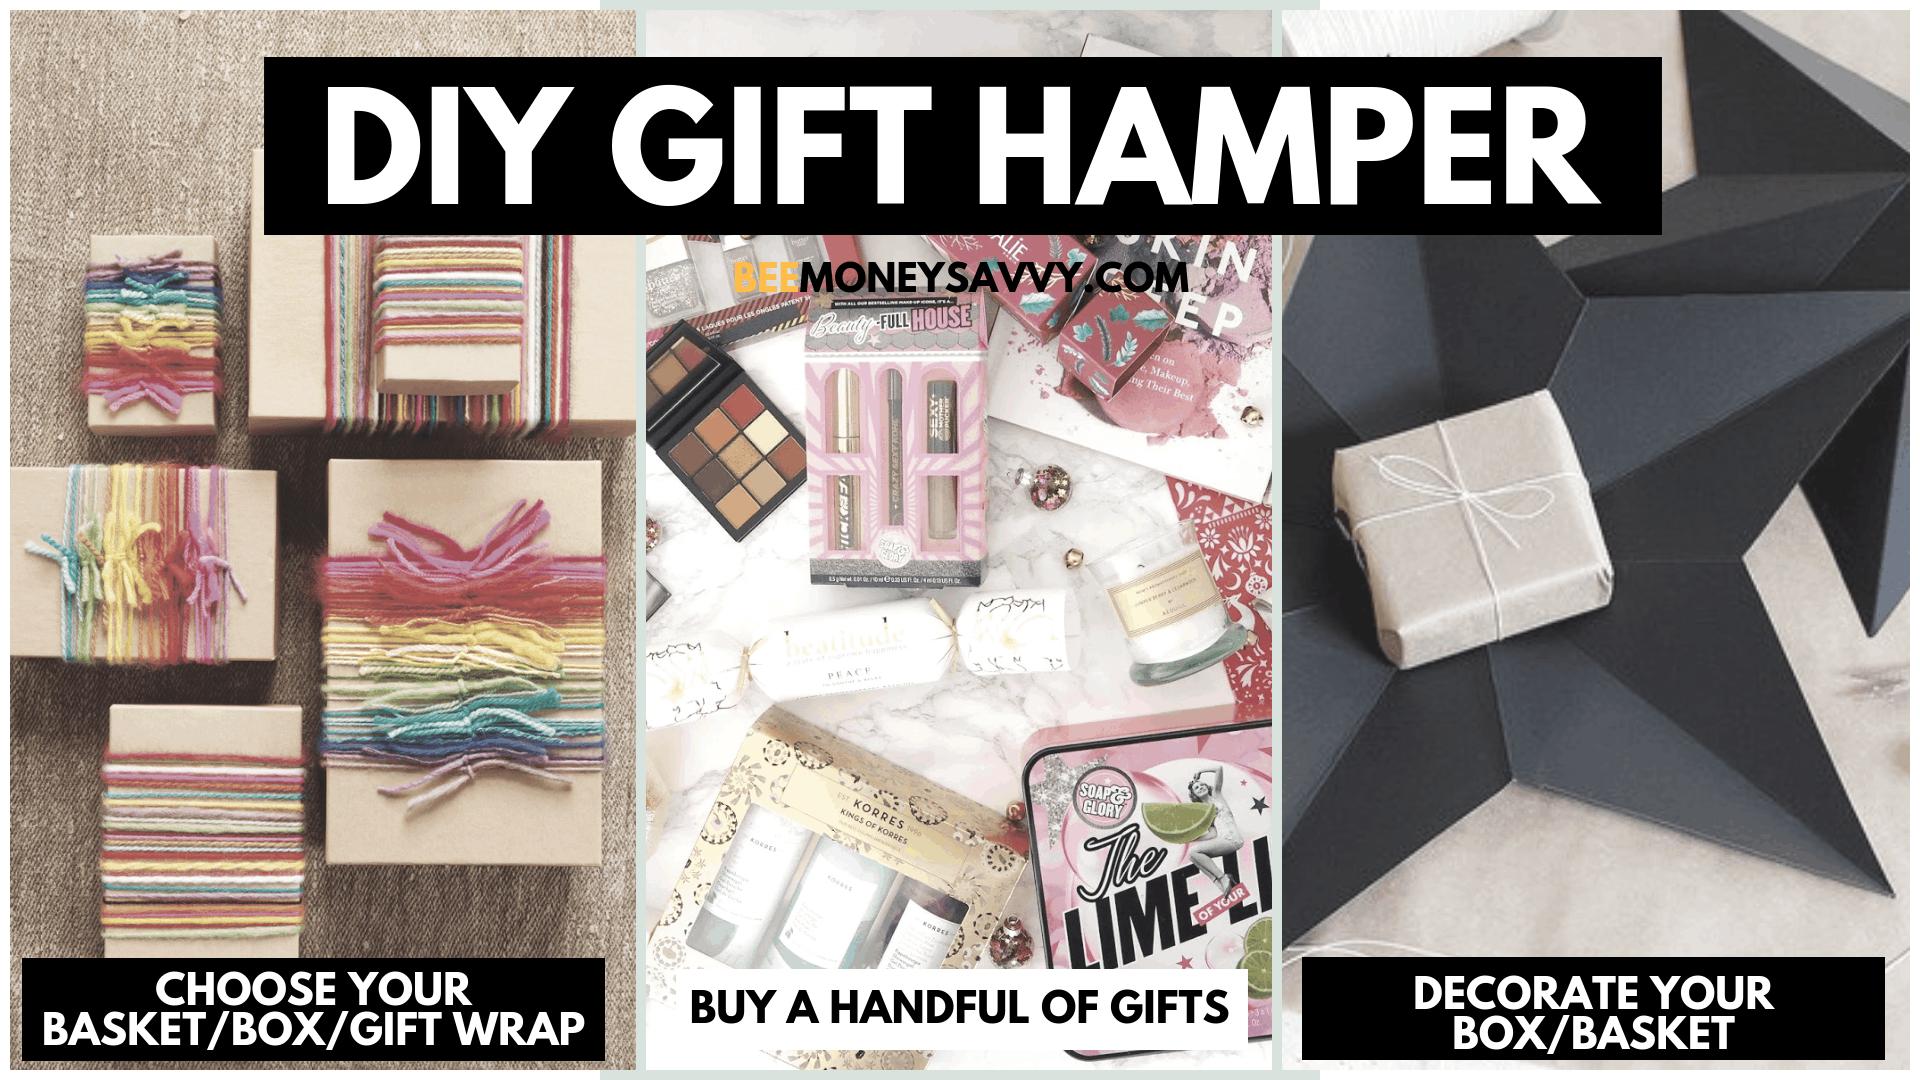 DIY gift hamper